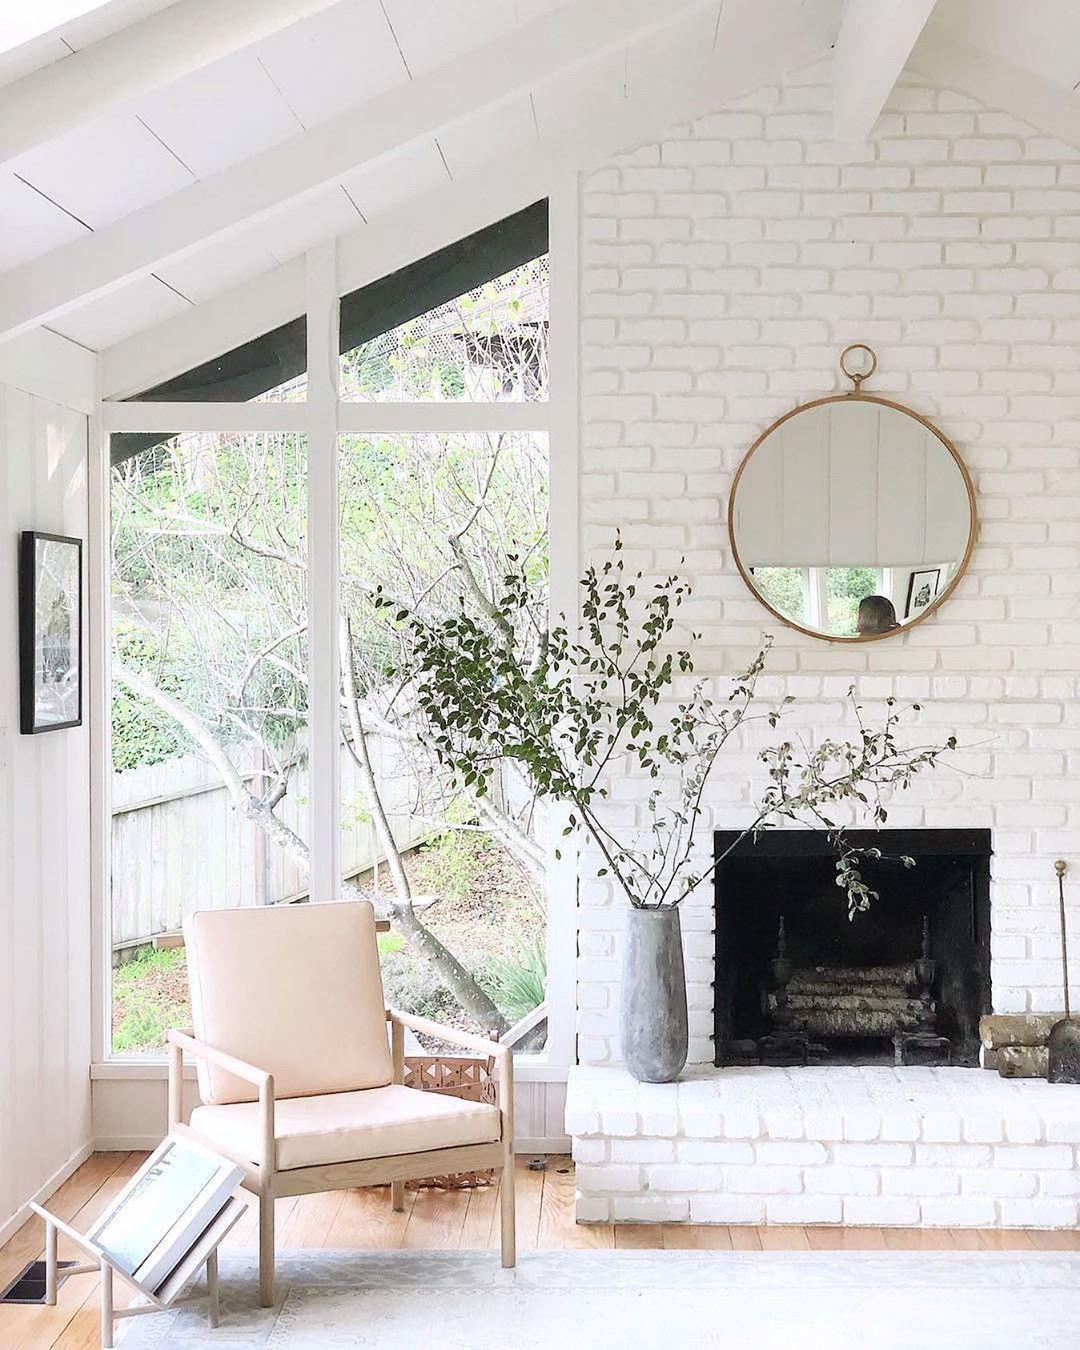 "Lifestyle & Goods on Instagram: ""Windows + Plants = Dream House . Reposted from @apartment_34 . . . . . . . . . . . . . . . #mymidcenturymix #mycrispcasa…"""